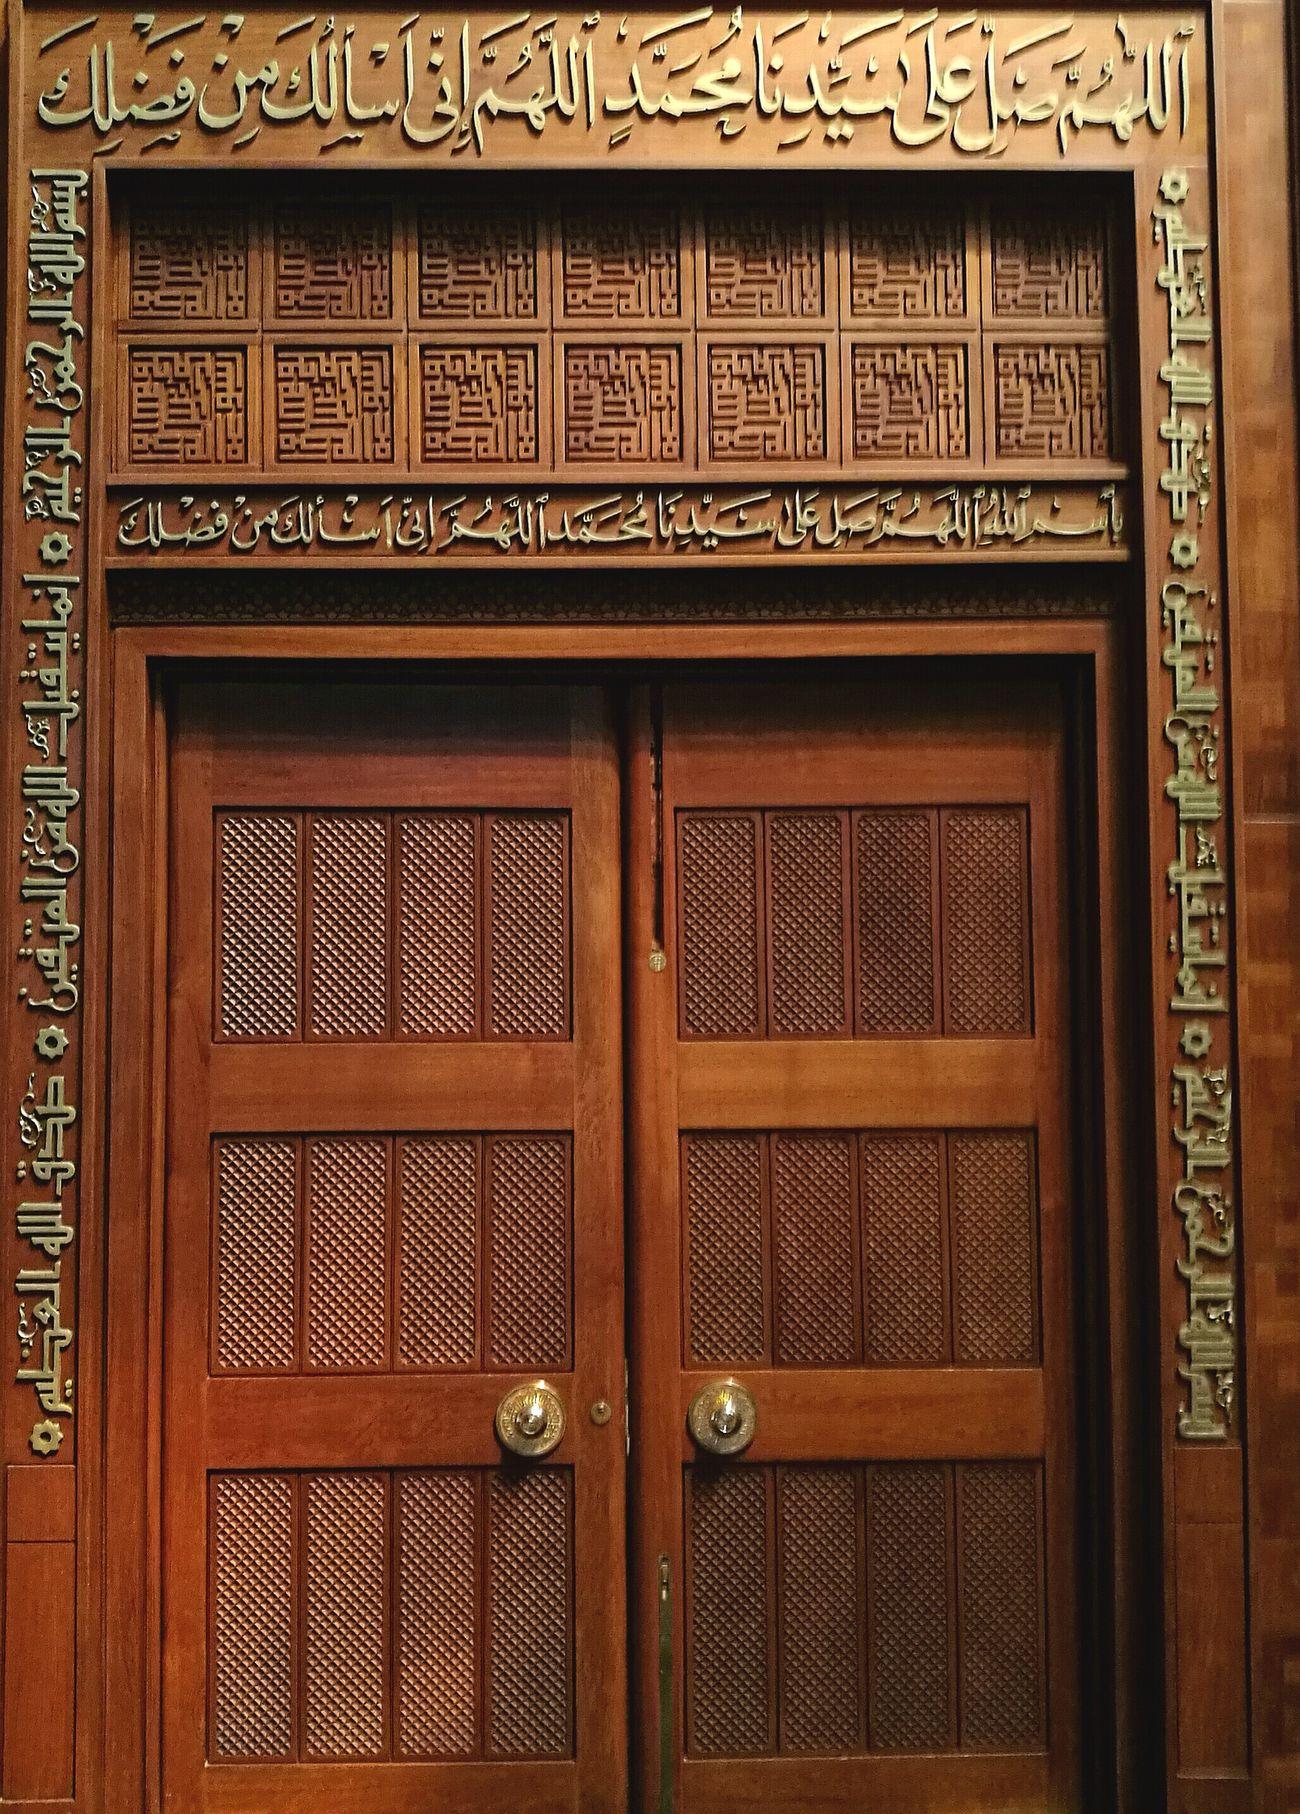 The Grand Masjid .. Kuwait Yousf Ali Kuwait City Huaweiphotography Huawei P9 Leica Islamic Architecture Islamic Design